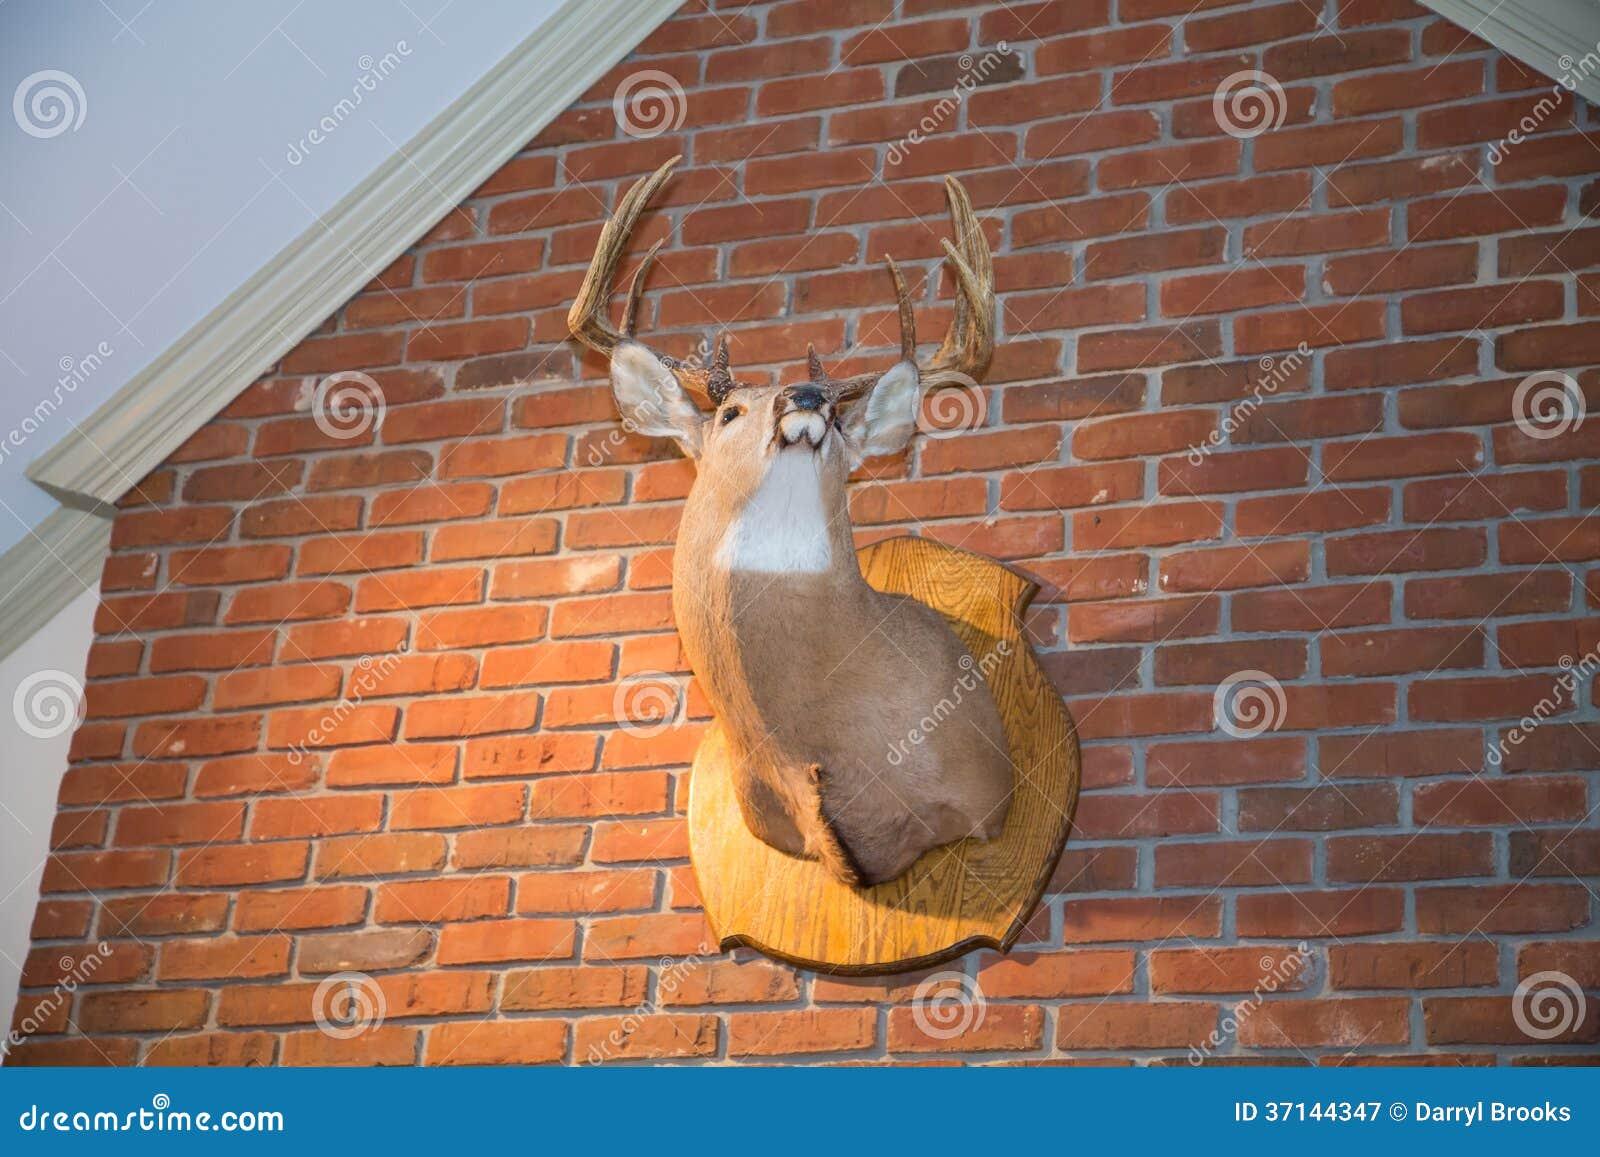 Mounted Deer Head On Brick Wall Stock Image Image Of